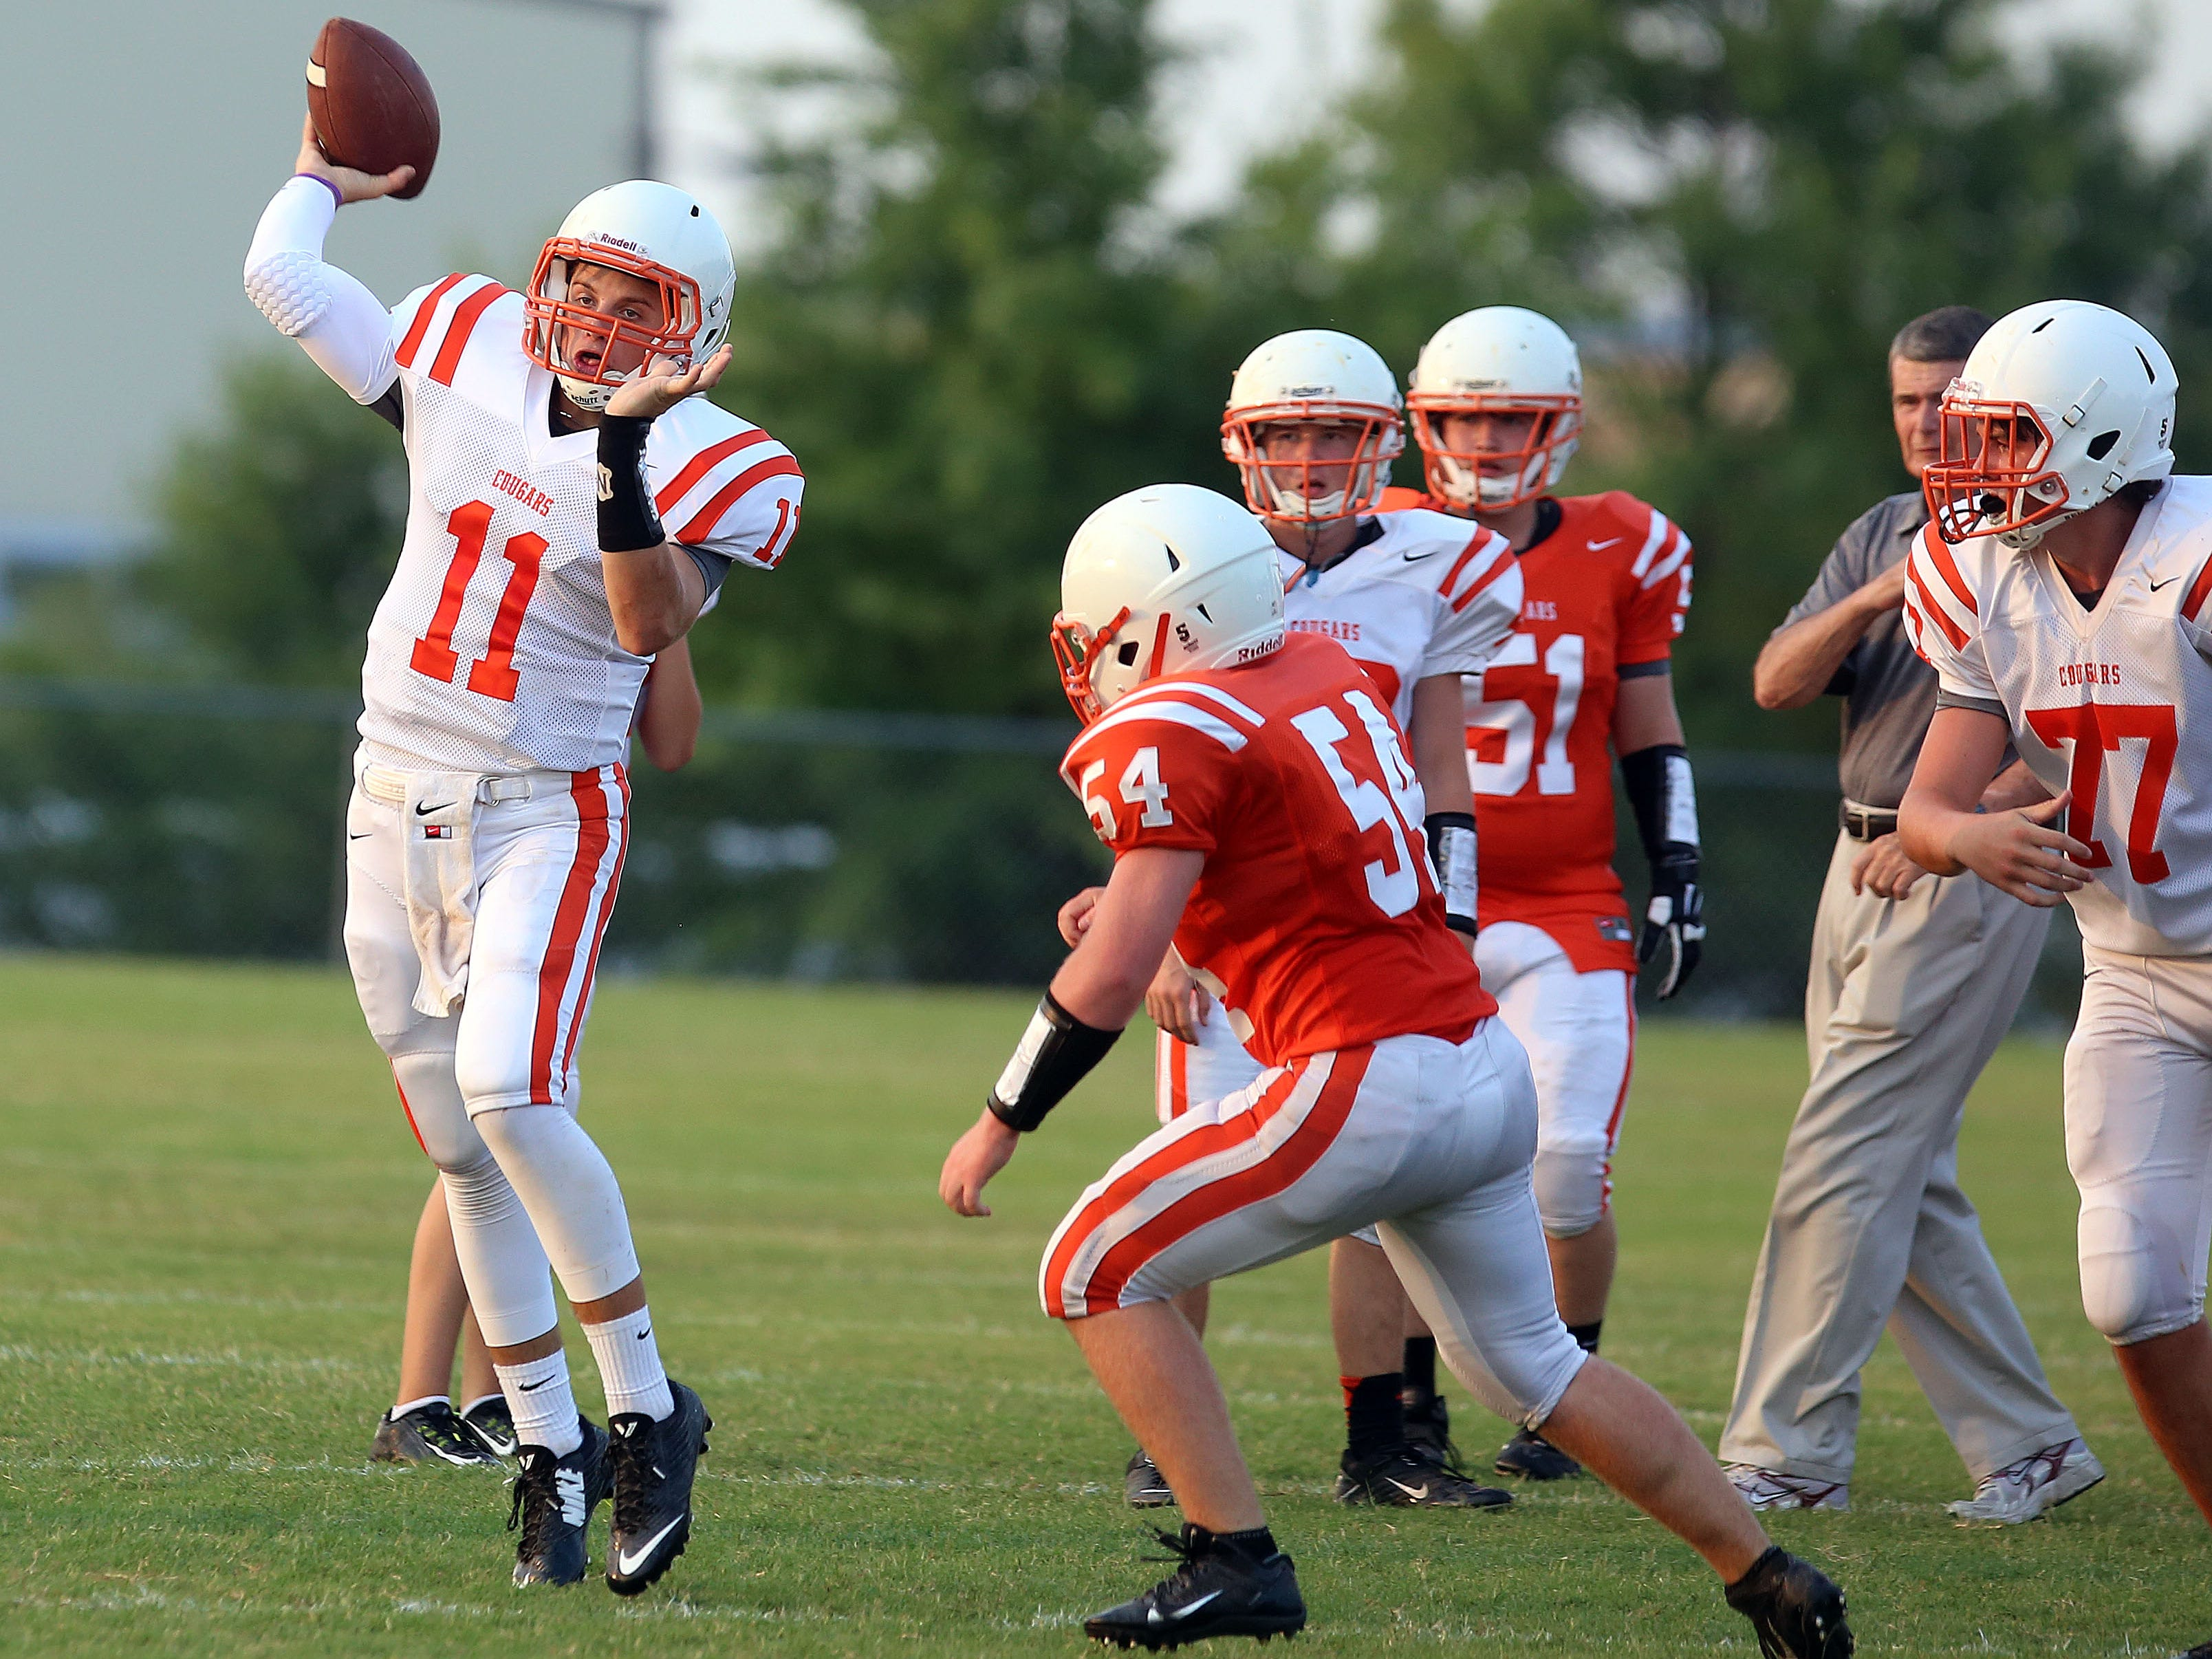 MTCS quarterback Justin Winn enters his second full season as the Cougars' startering quarterback.